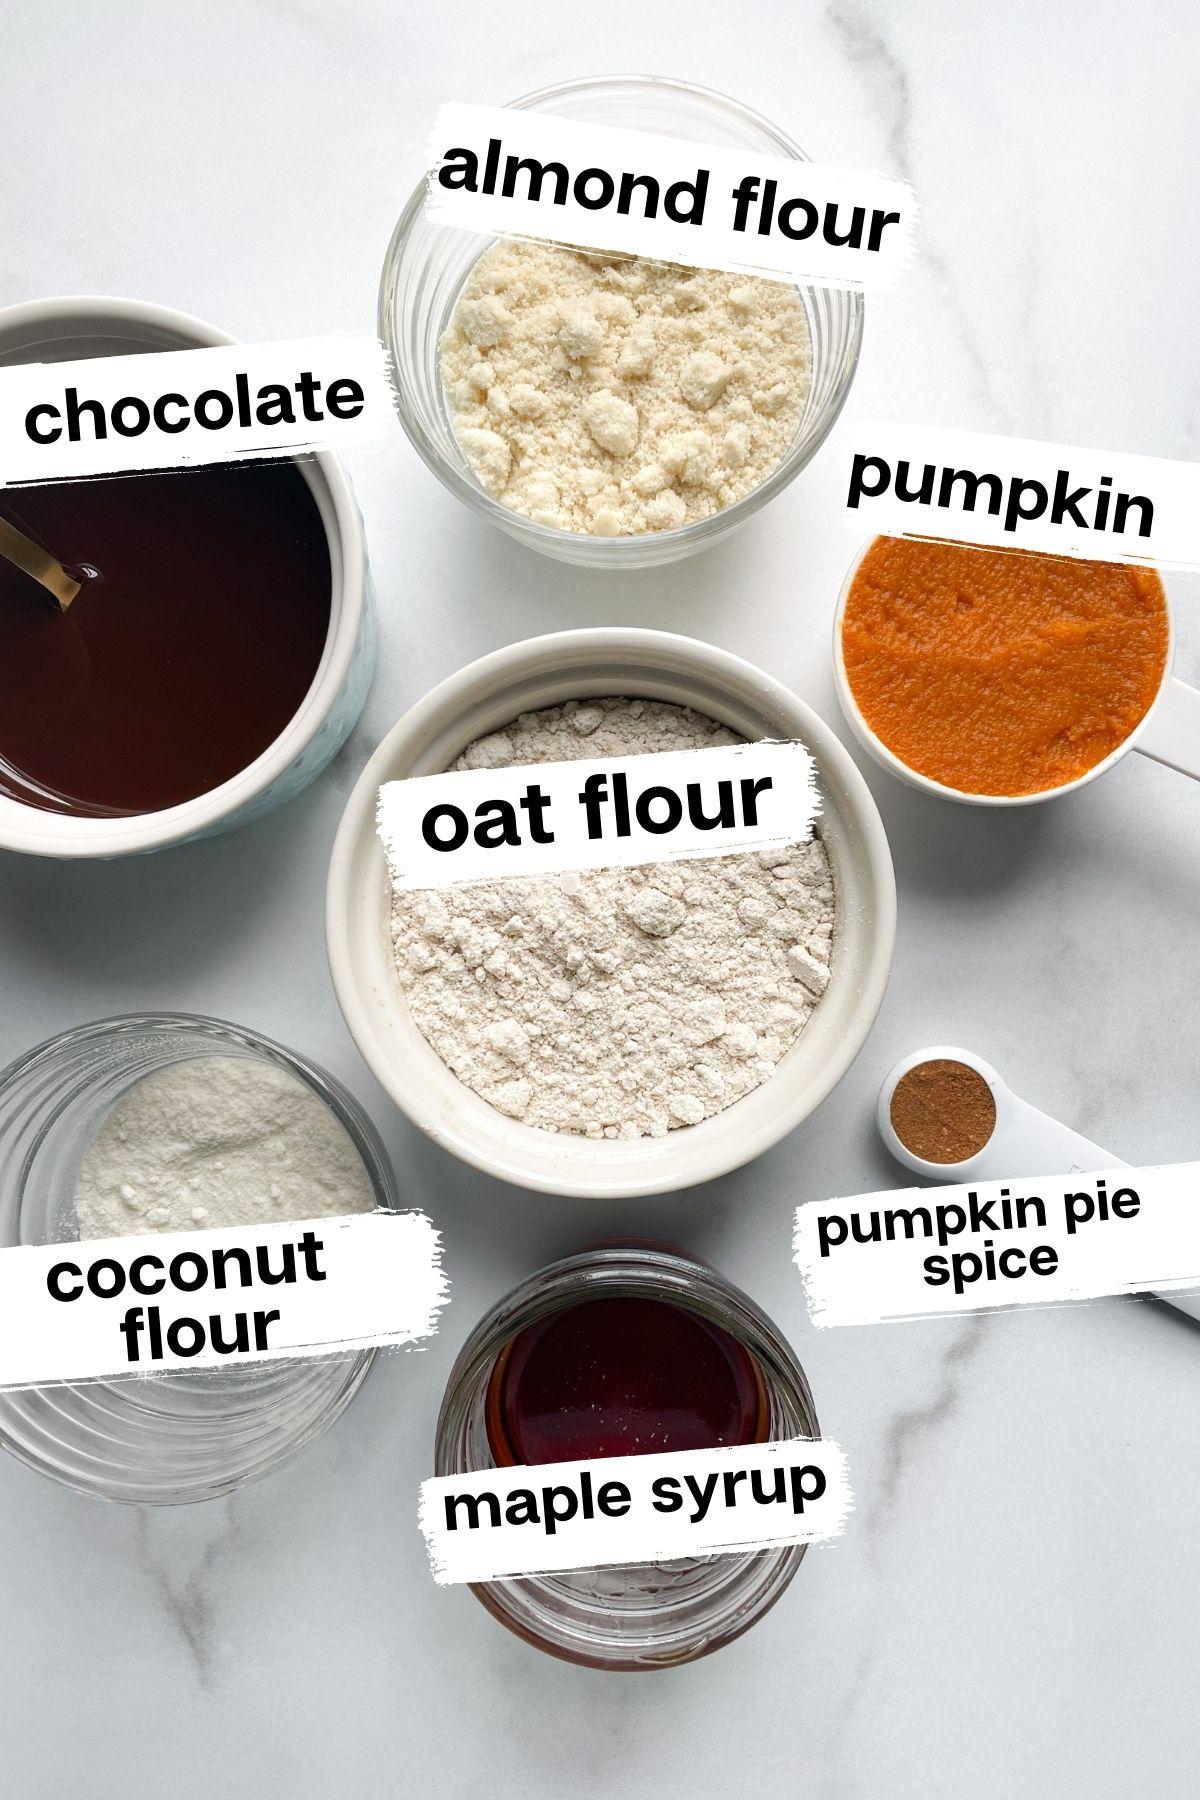 ingredients in bowls for pumpkin spice truffles